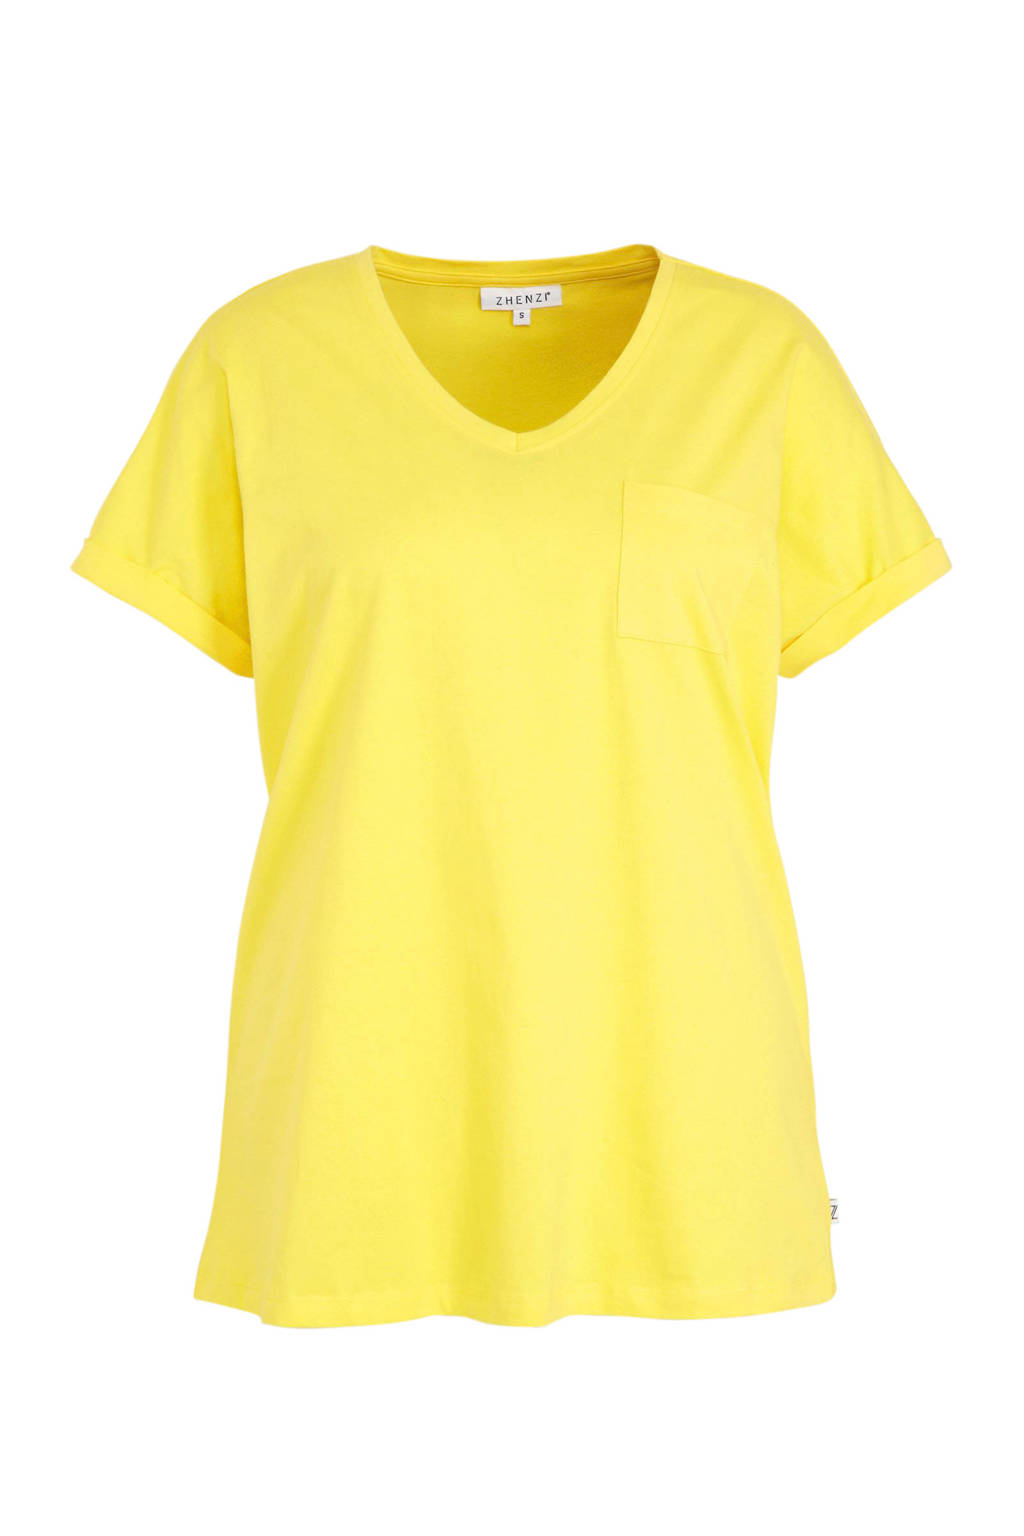 Zhenzi T-shirt geel, Geel